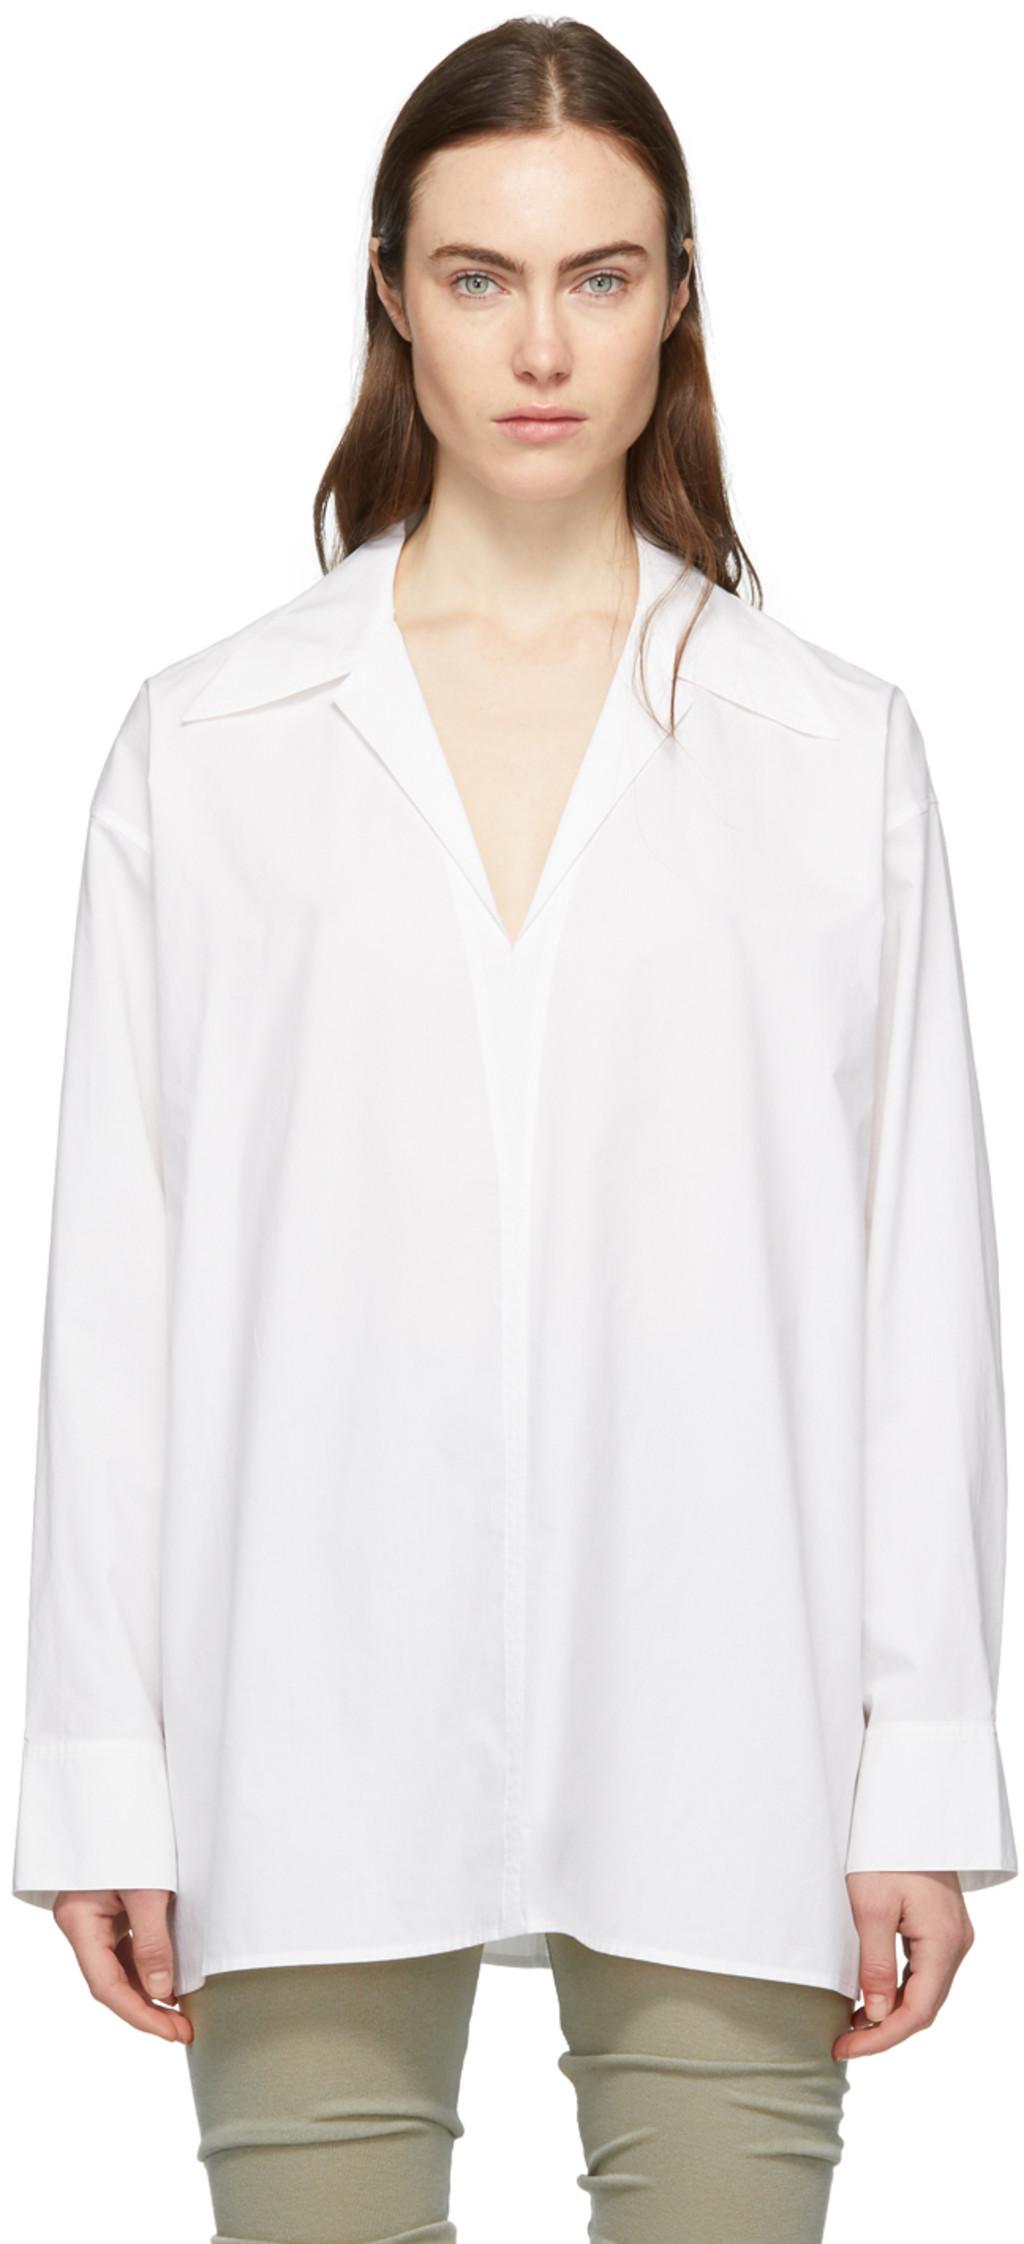 Designer Shirts For Women Ssense